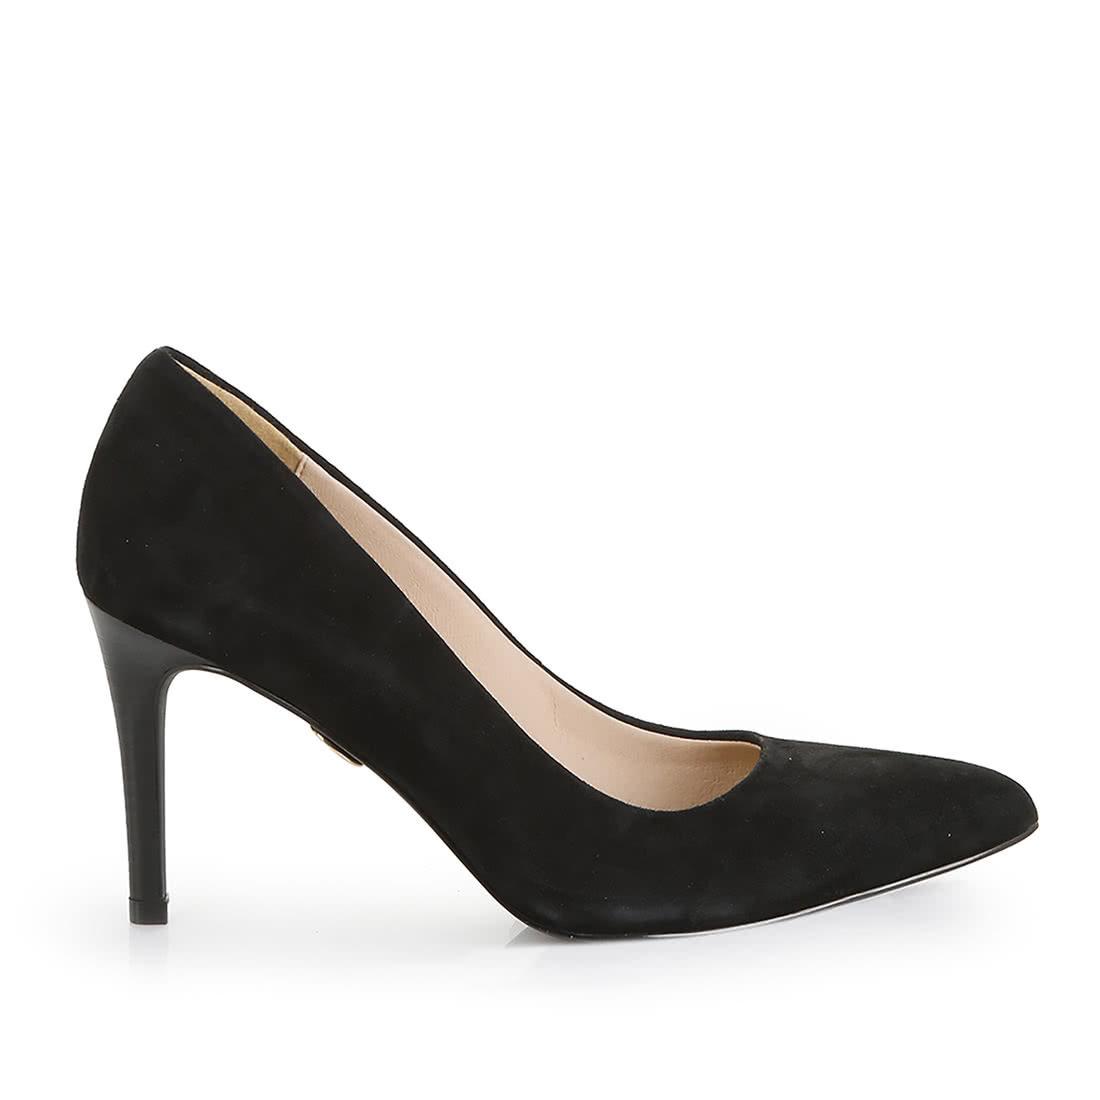 2b5ae3b0e Violet escarpin daim noir acheter à BUFFALO en ligne | BUFFALO®